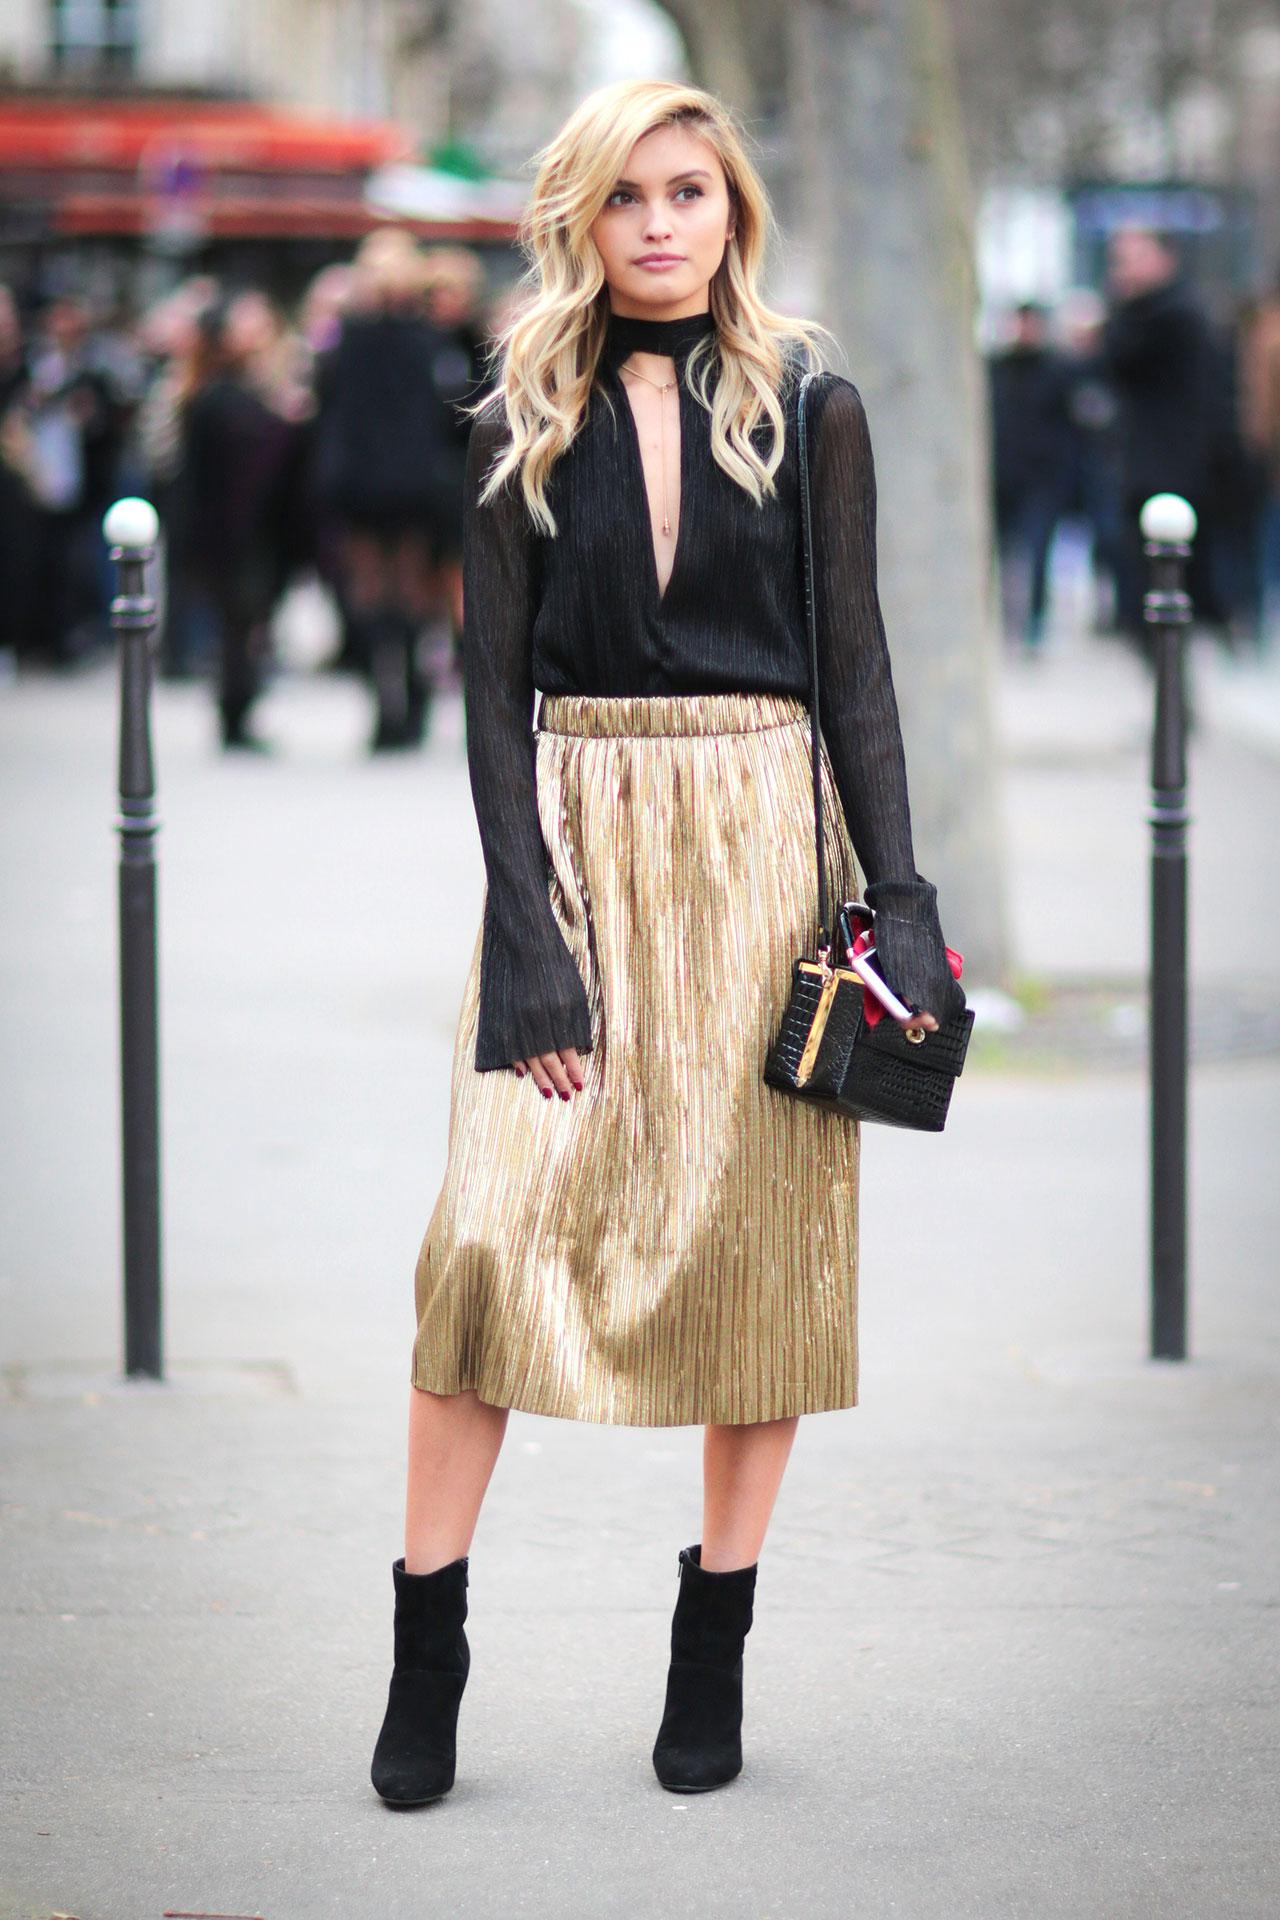 o-tan-midi-skirt-black-top-blouse-black-bag-blonde-black-shoe-booties-pleat-metallic-howtowear-fashion-style-outfit-fall-winter-holiday-dinner.jpg